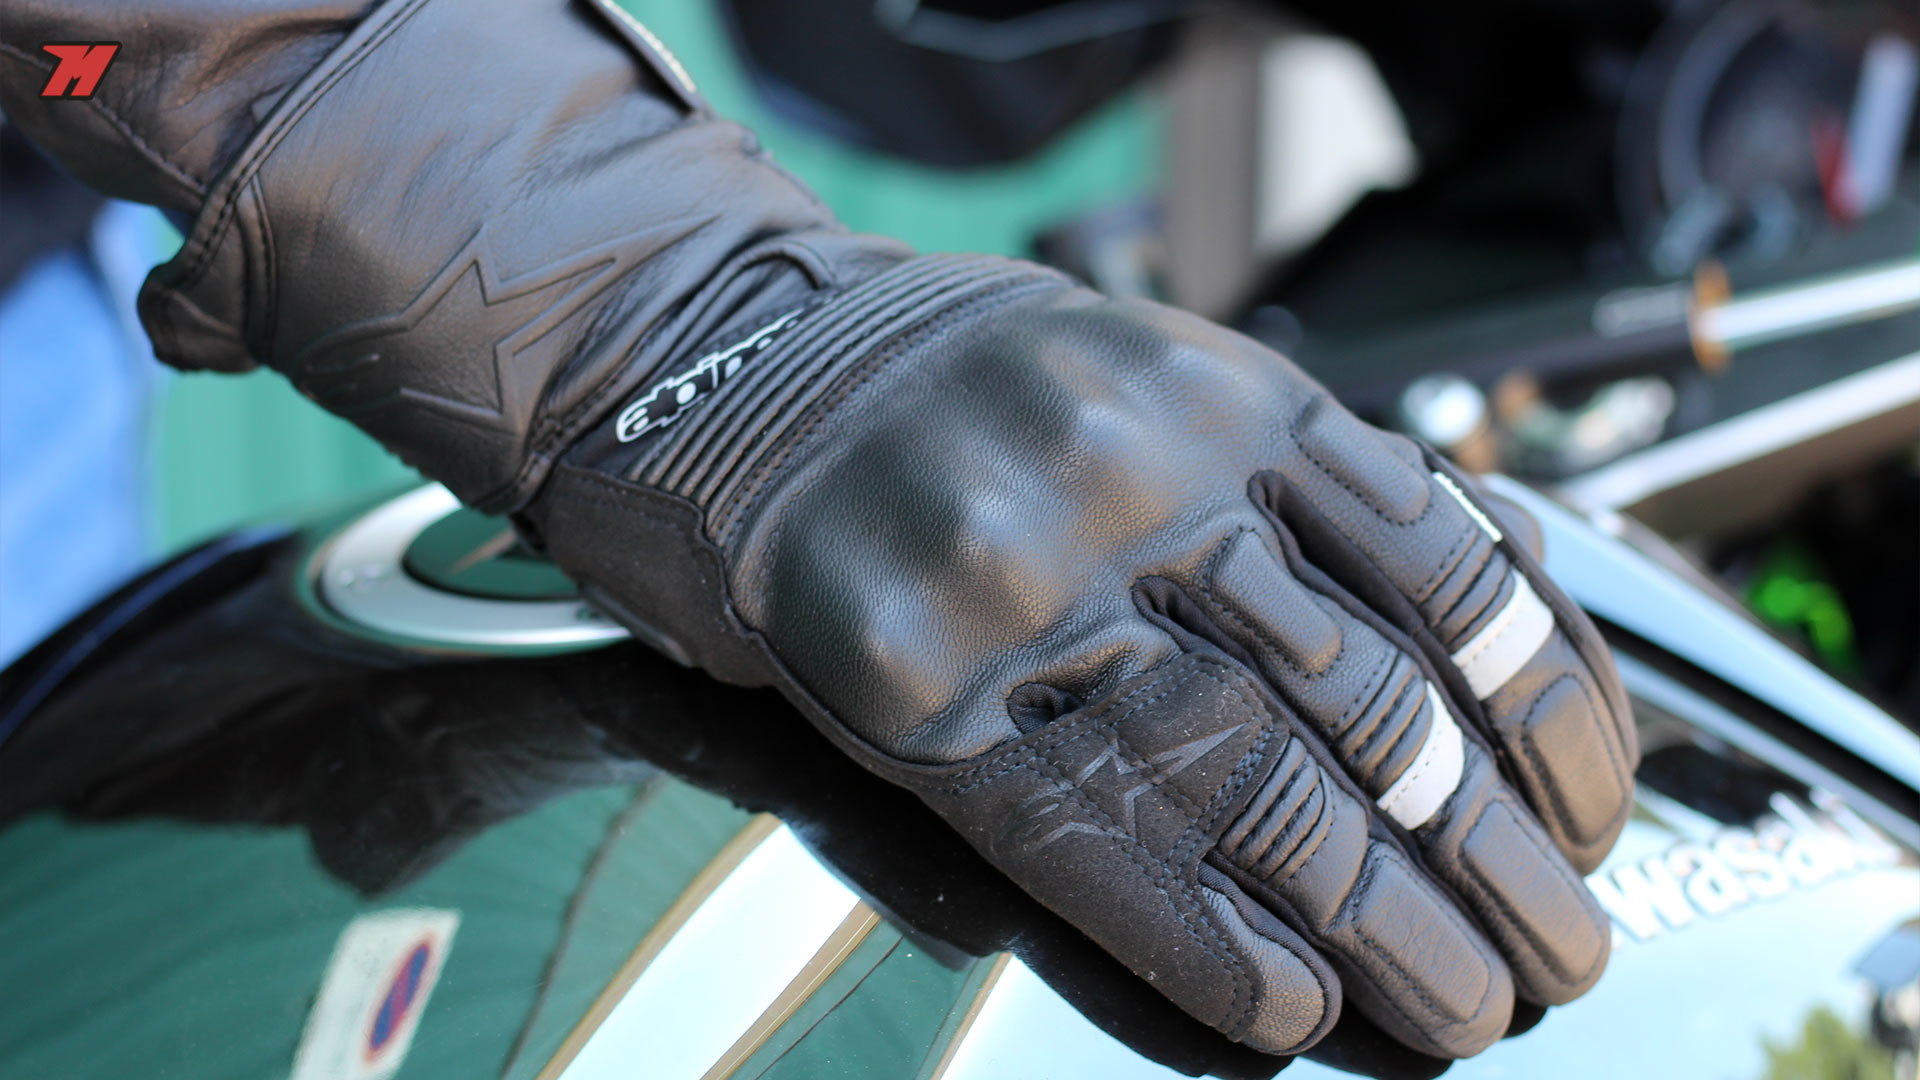 e88dfb82 Alpinestars Patron Gore-Tex Gore-Grip. Alpinestars motorcycle gloves